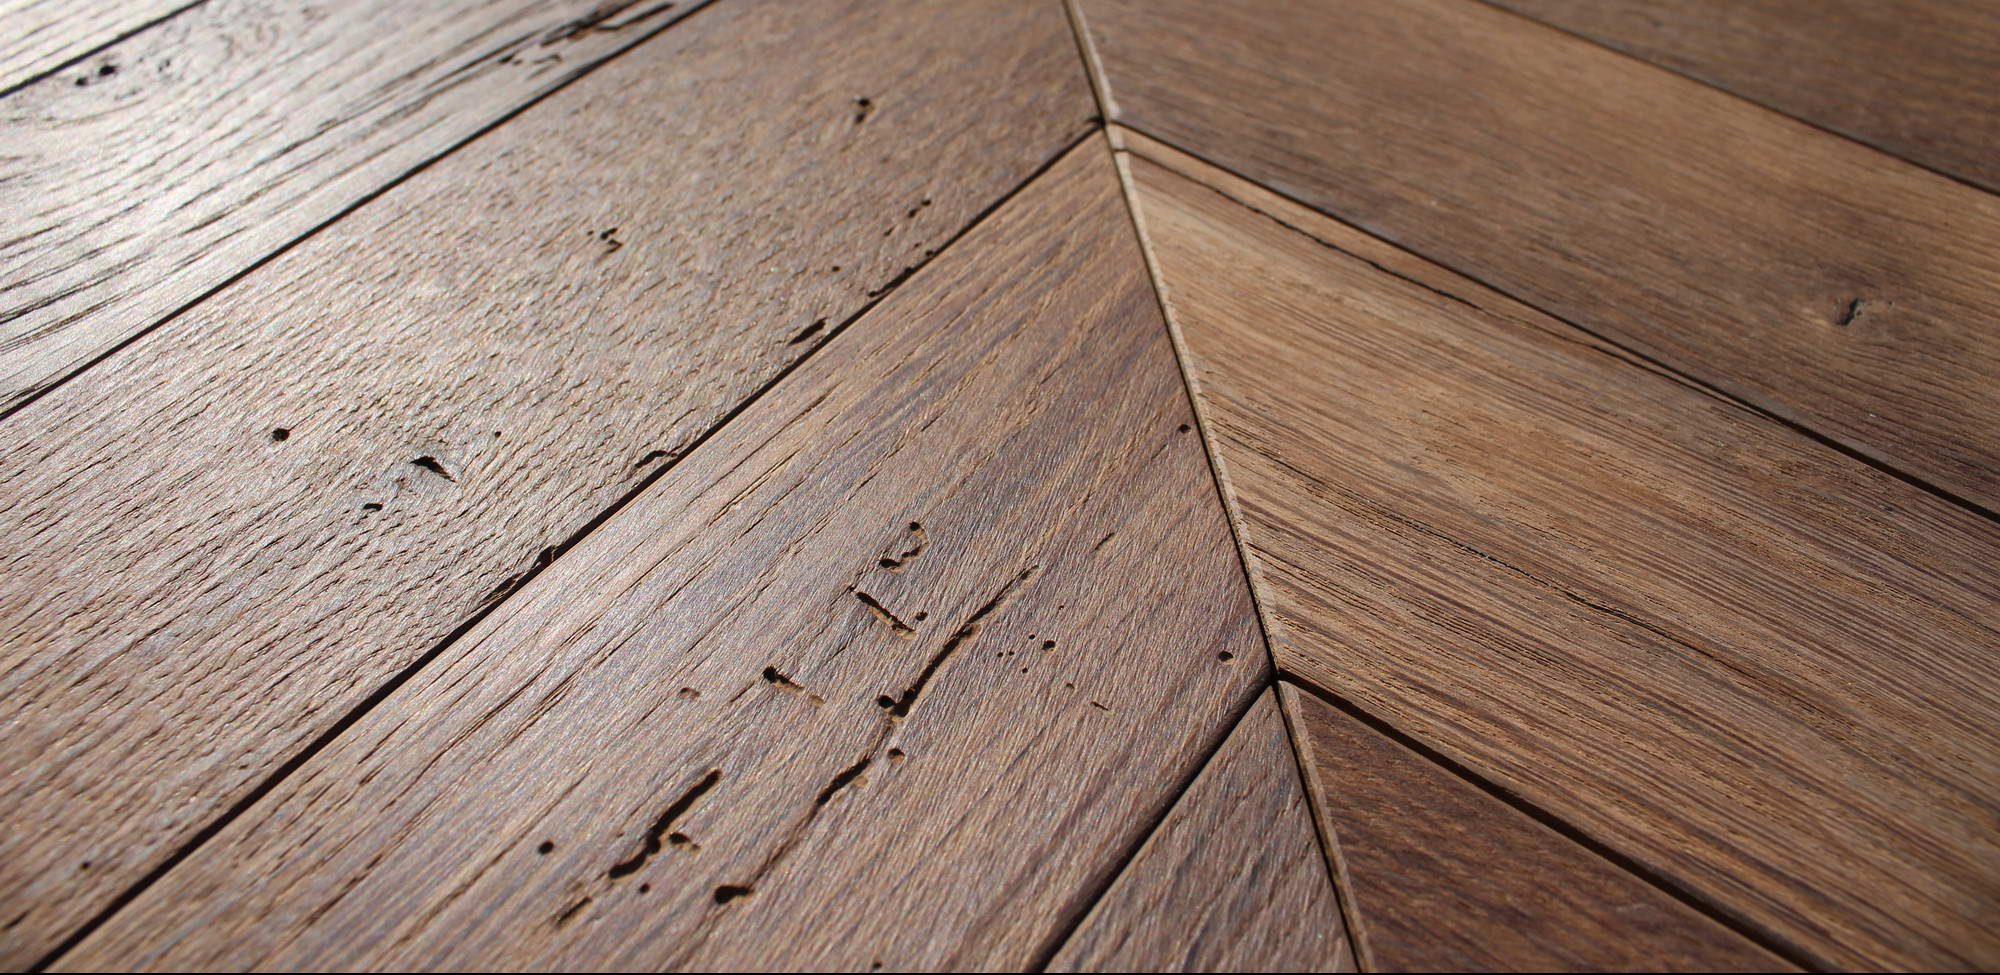 Chevron Parquet Oak Timber Flooring